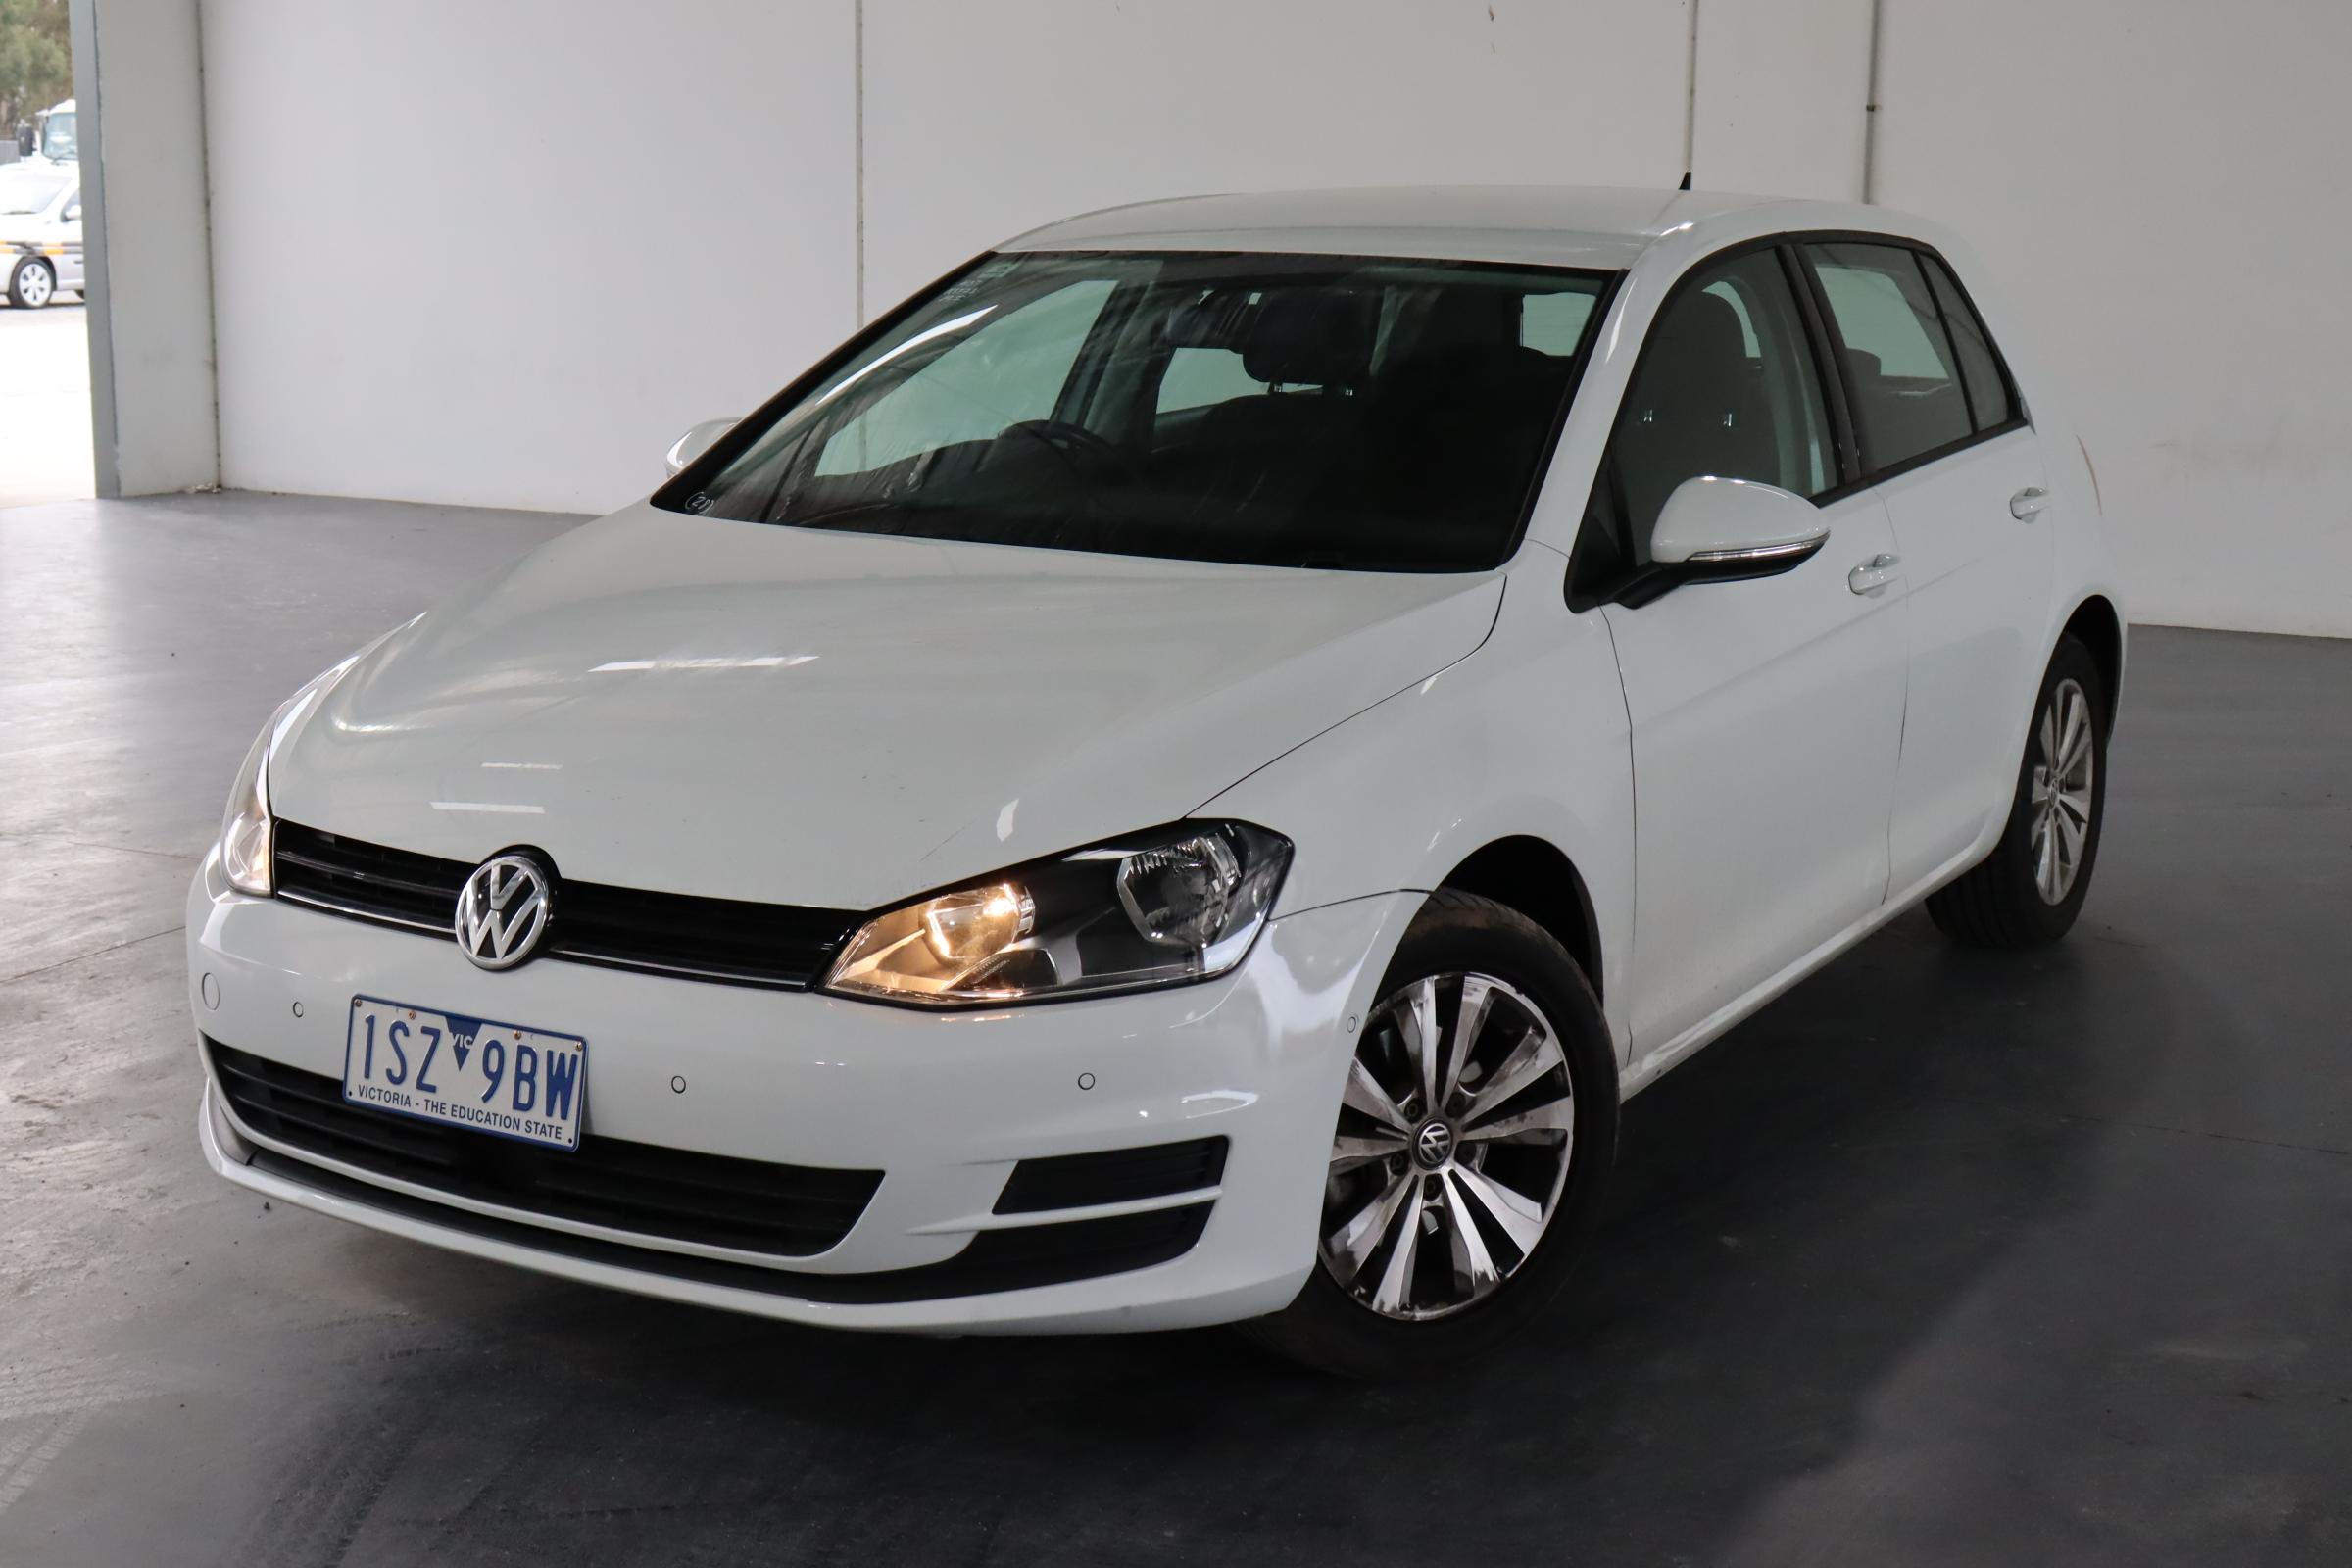 2015 Volkswagen Golf 92TSI COMFORTLINE A7 Auto Hatchback(WOVR+INSP)